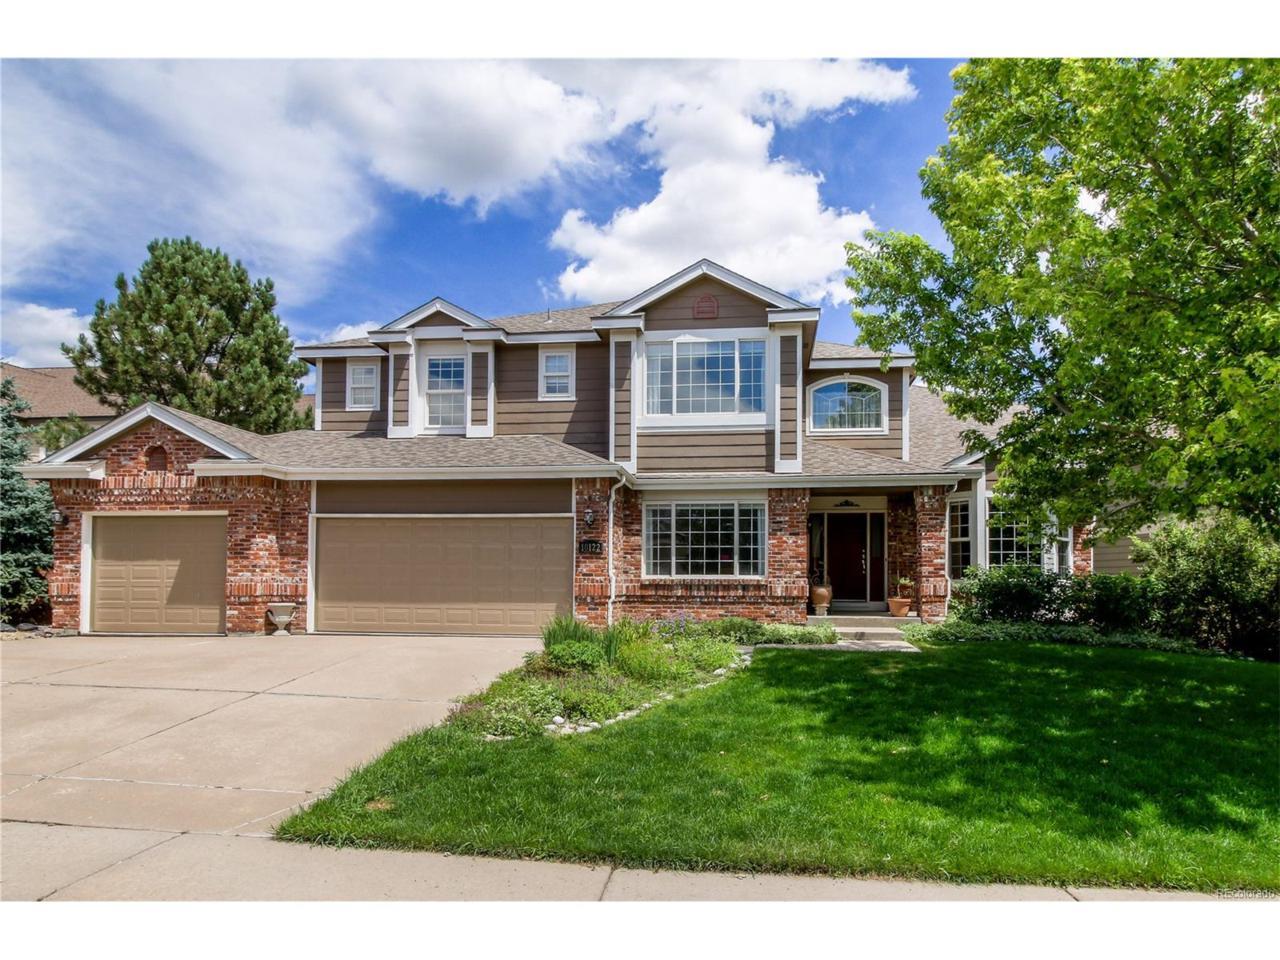 10122 Brady Place, Highlands Ranch, CO 80130 (MLS #9915574) :: 8z Real Estate